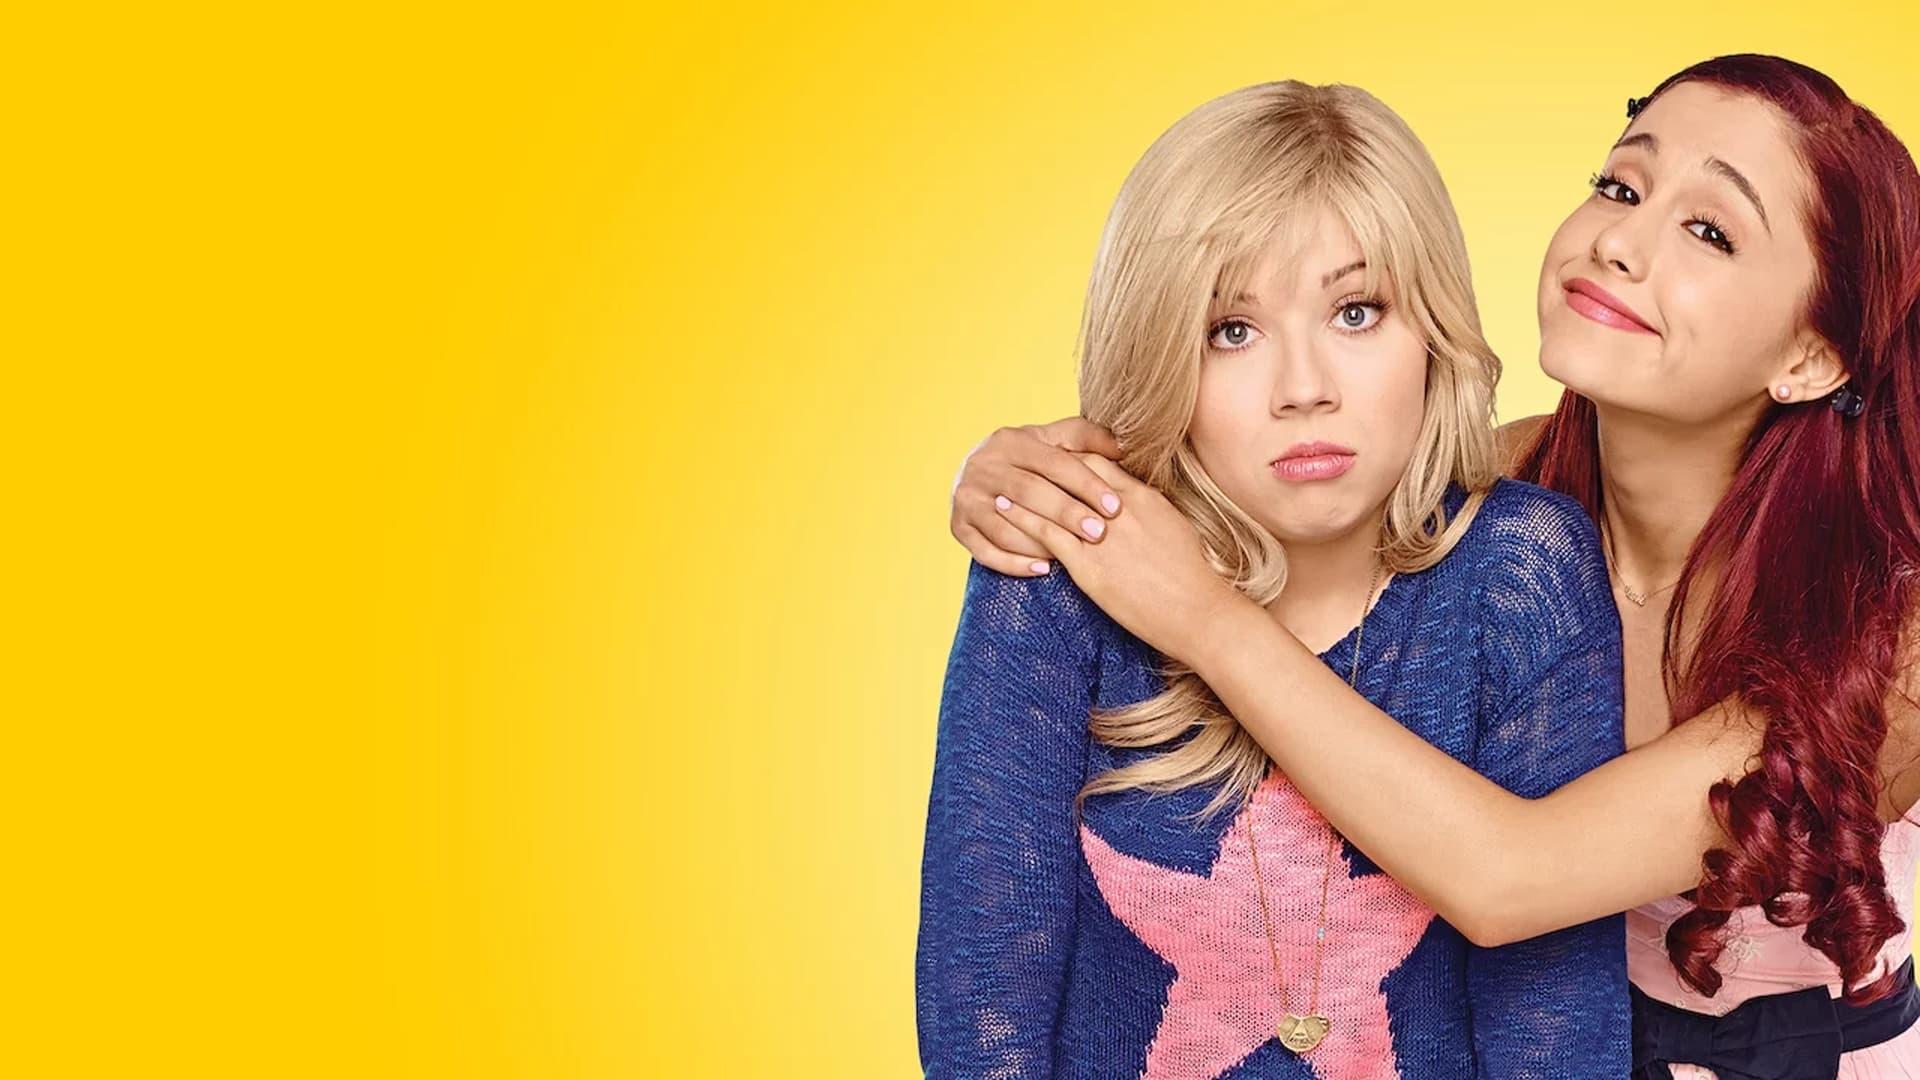 Nickelodeon cancels Sam & Cat